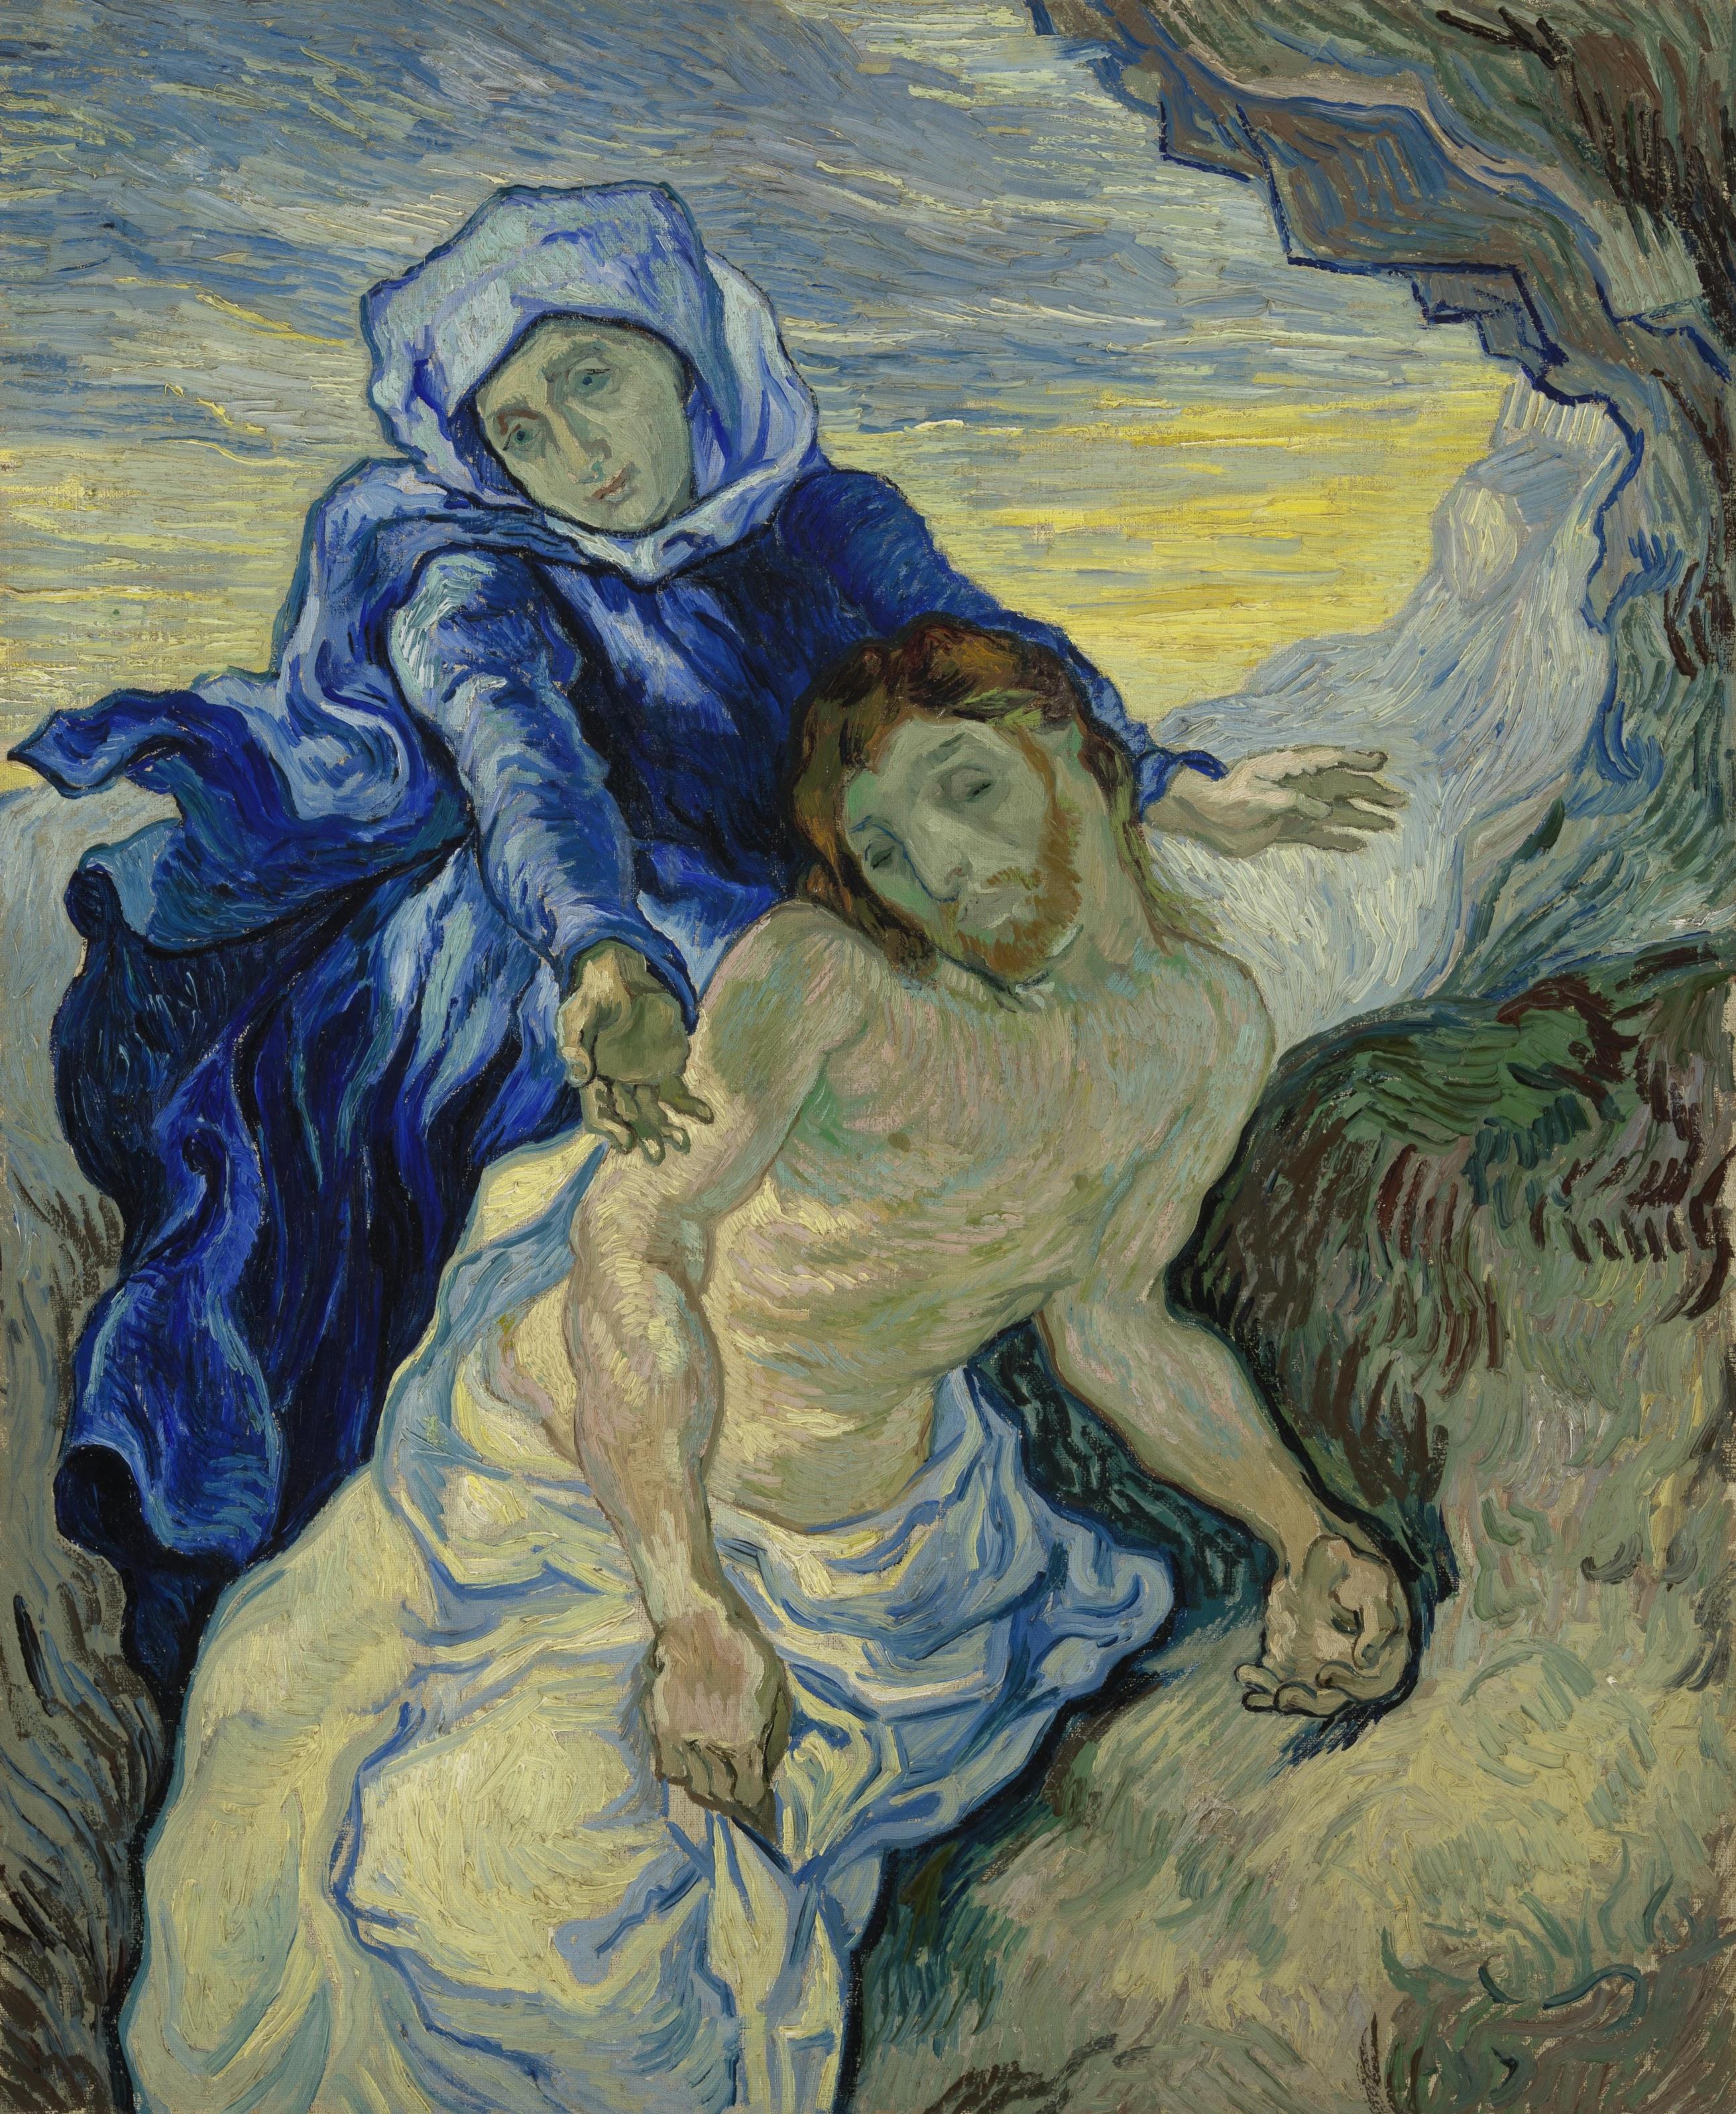 Pieta (after Delacroix), Van Gogh